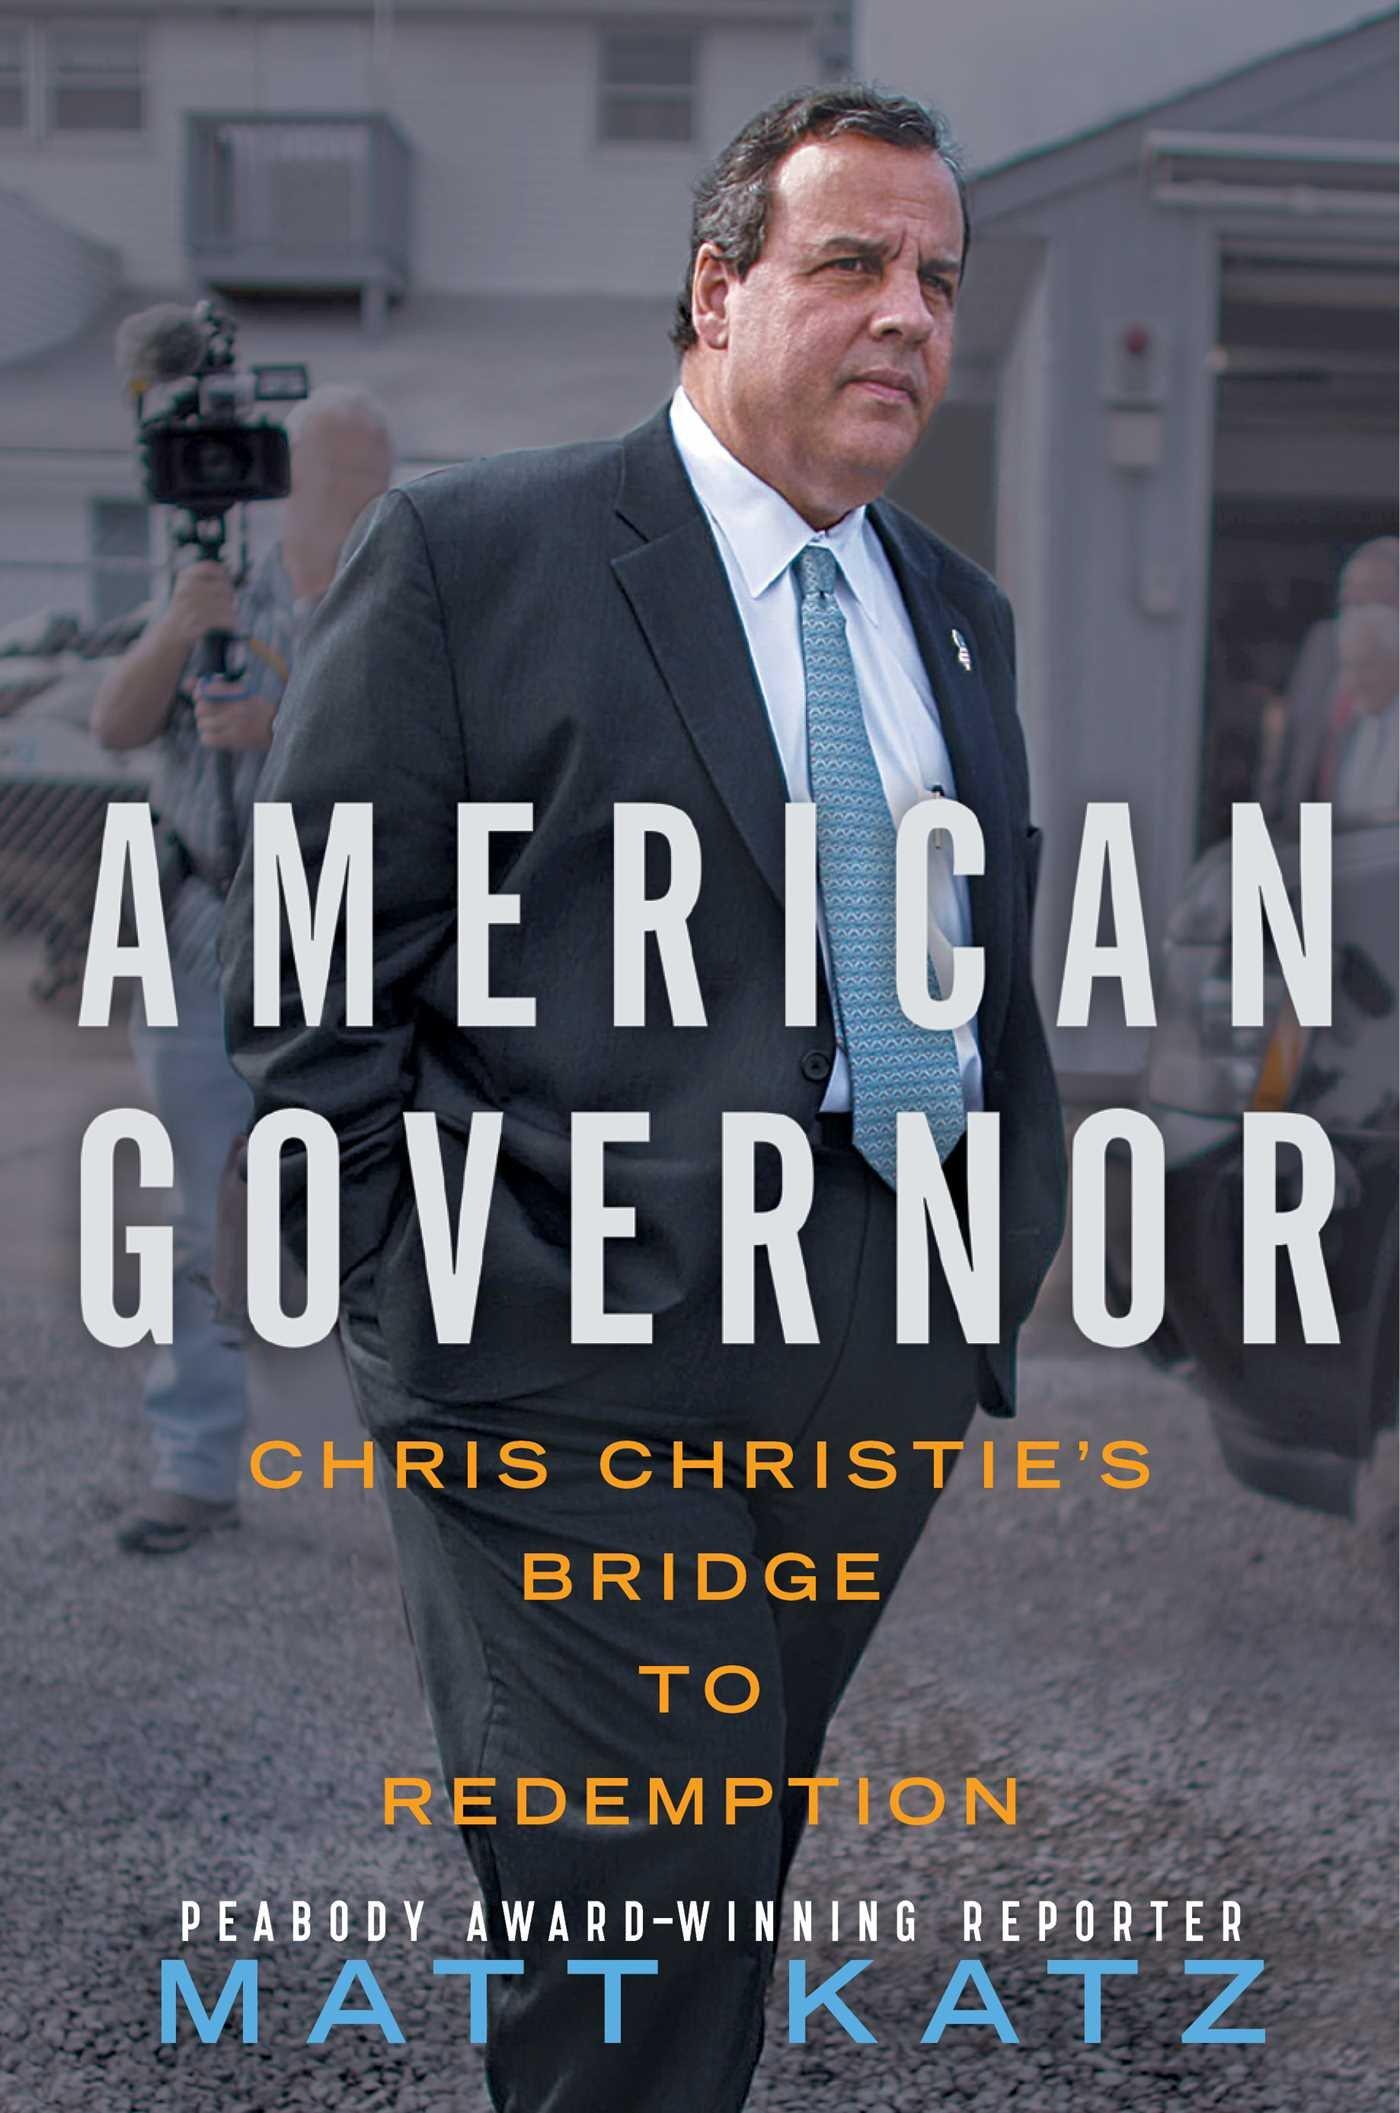 Matt Katz has reported on Christie since 2011.